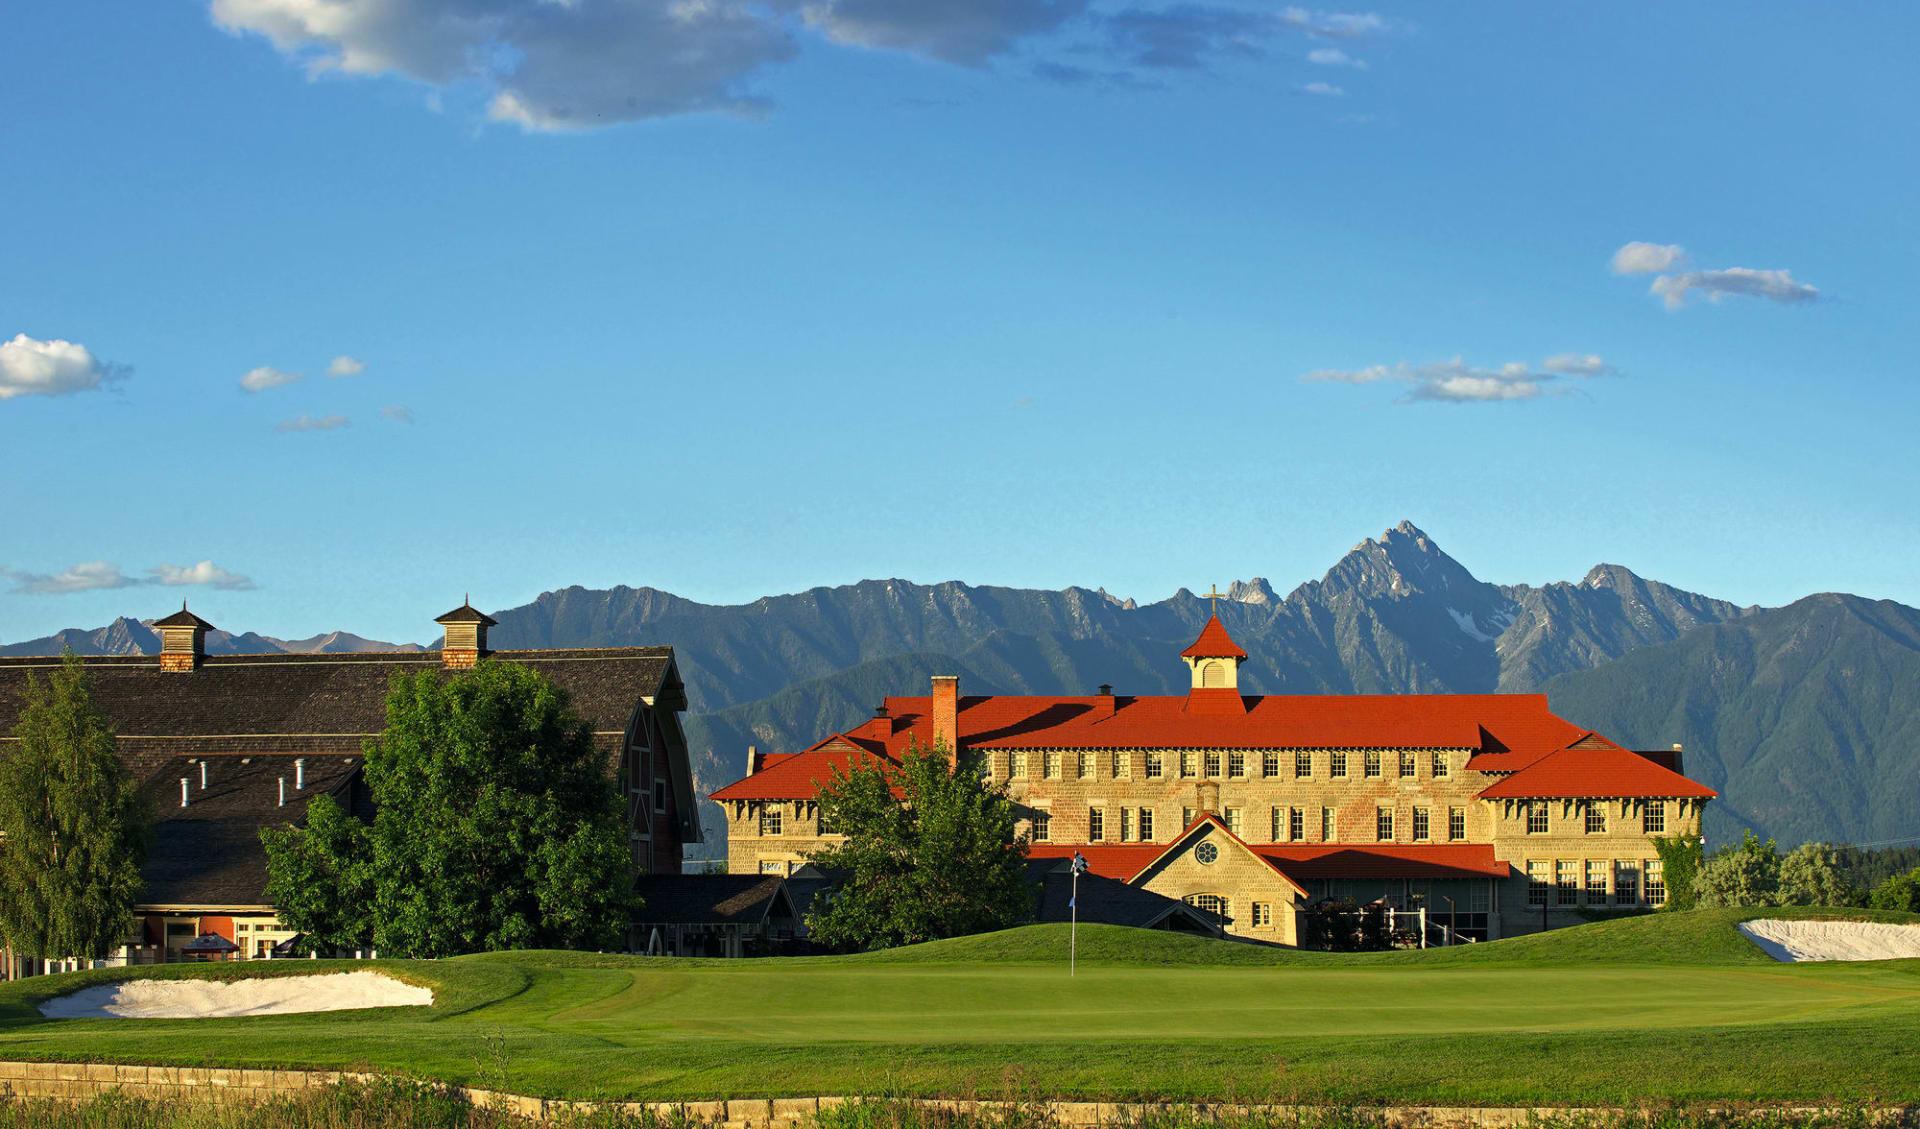 St. Eugene Golf Resort & Casino in Cranbrook:  St. Eugene Golf Resort, Cranbrook (BC)